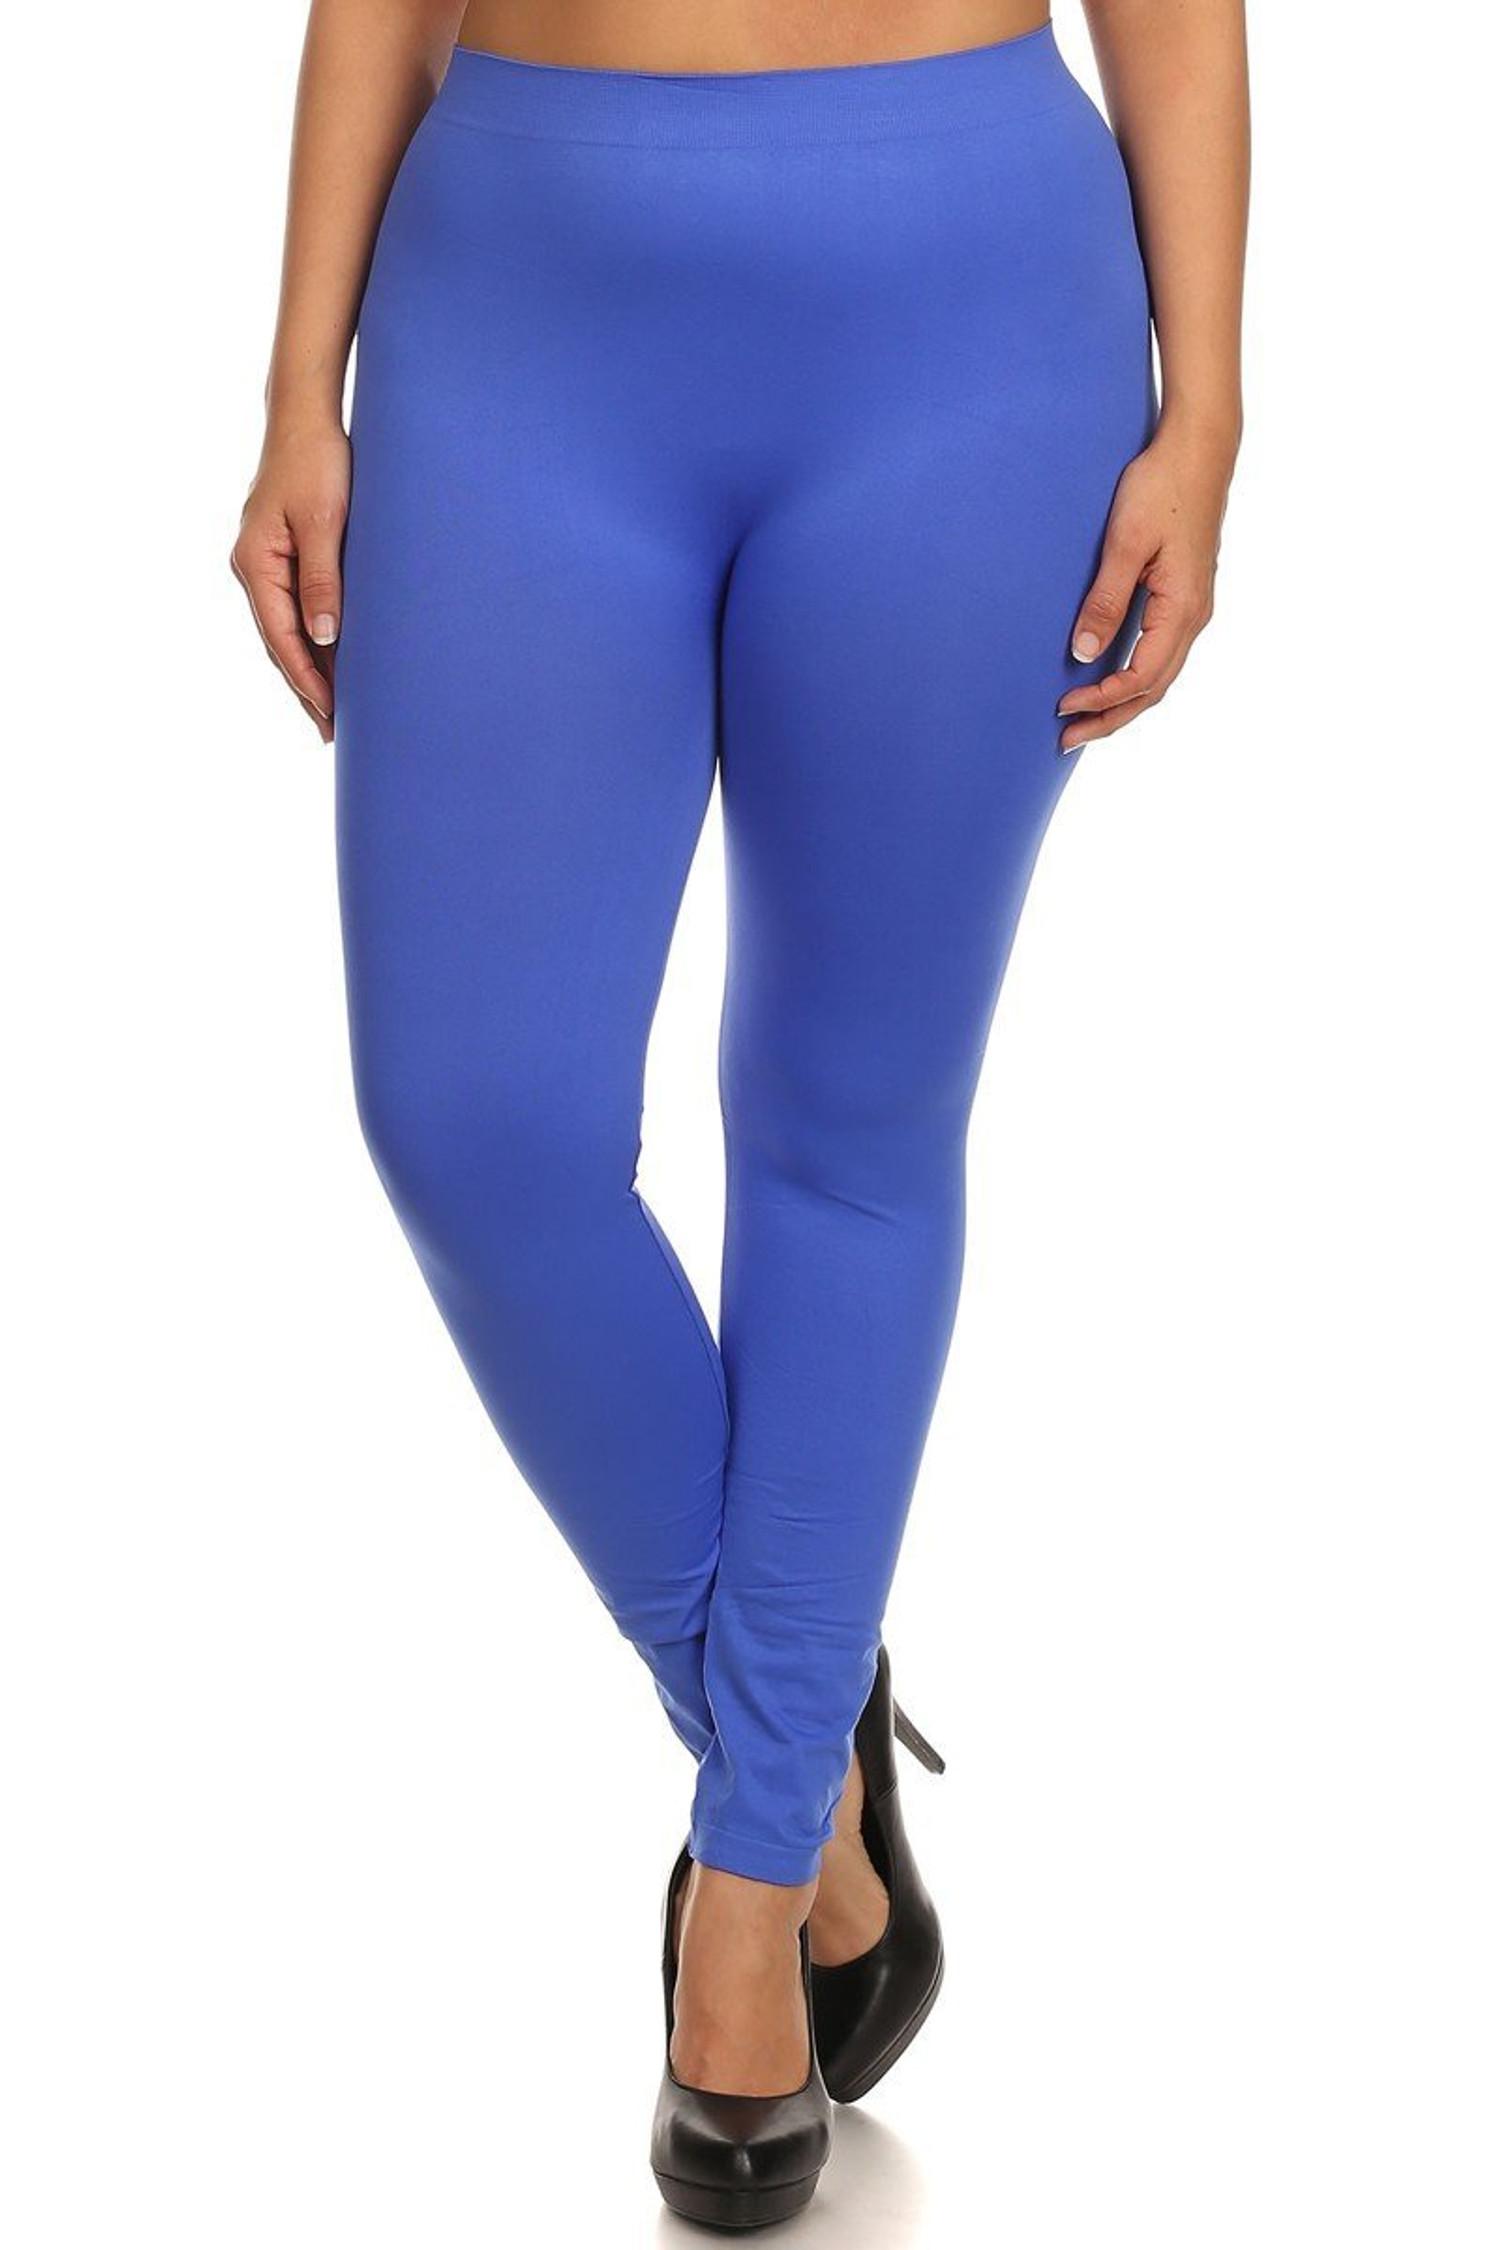 Royal Blue Full Length Nylon Spandex Leggings - Plus Size